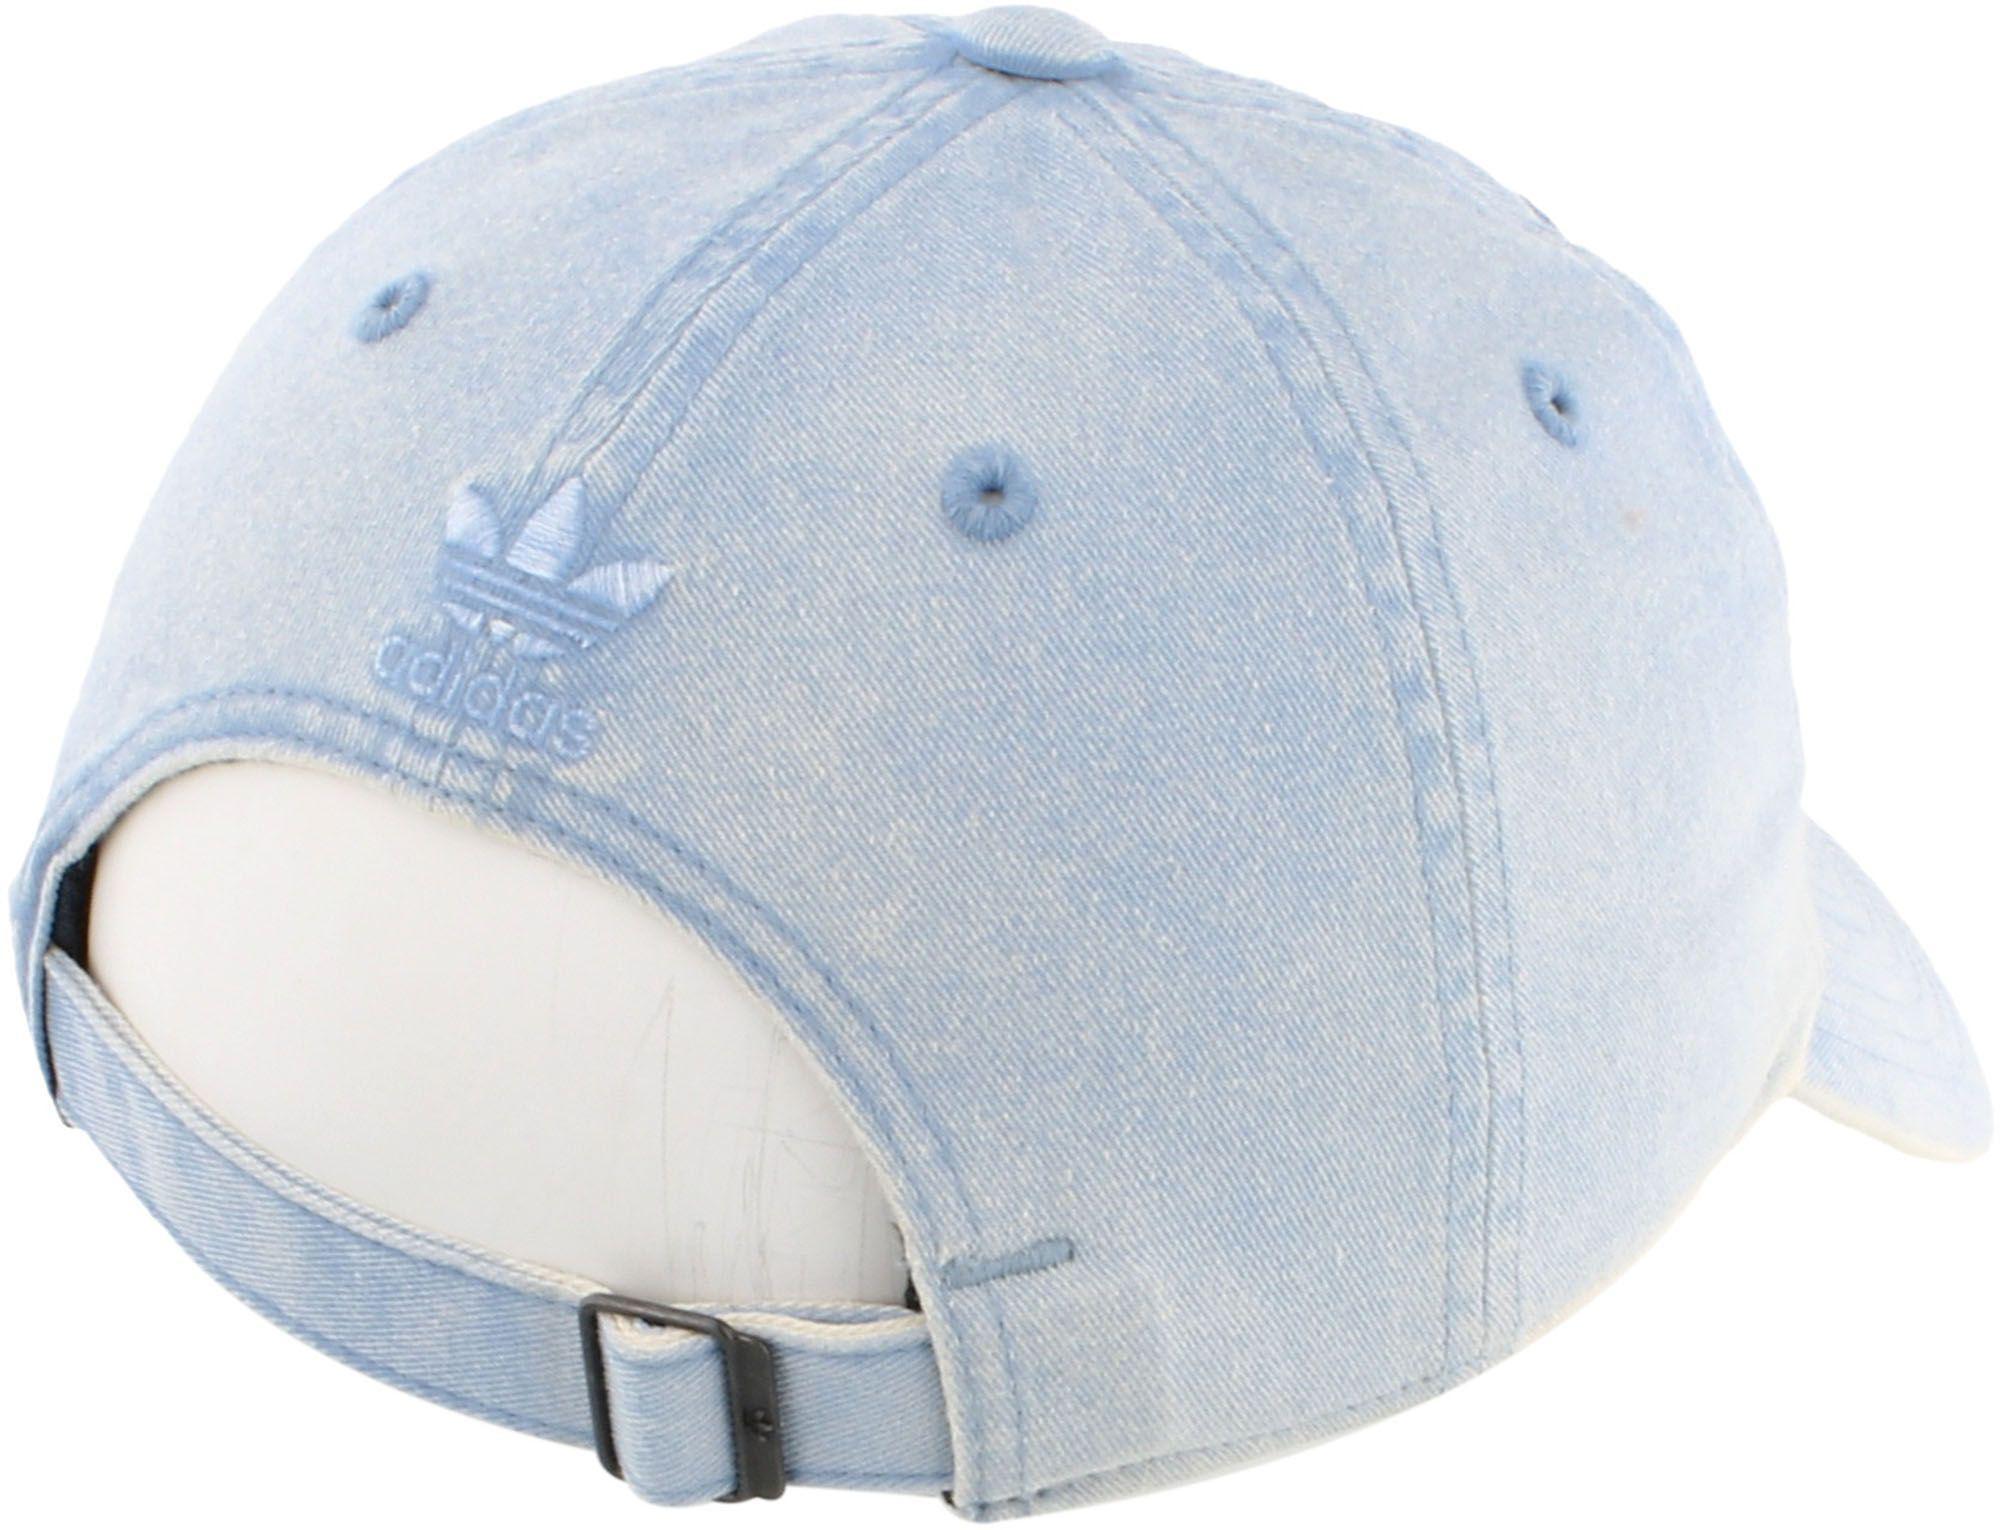 081b6b3328eb3 Adidas - Blue Originals Relaxed Overdye Hat - Lyst. View fullscreen